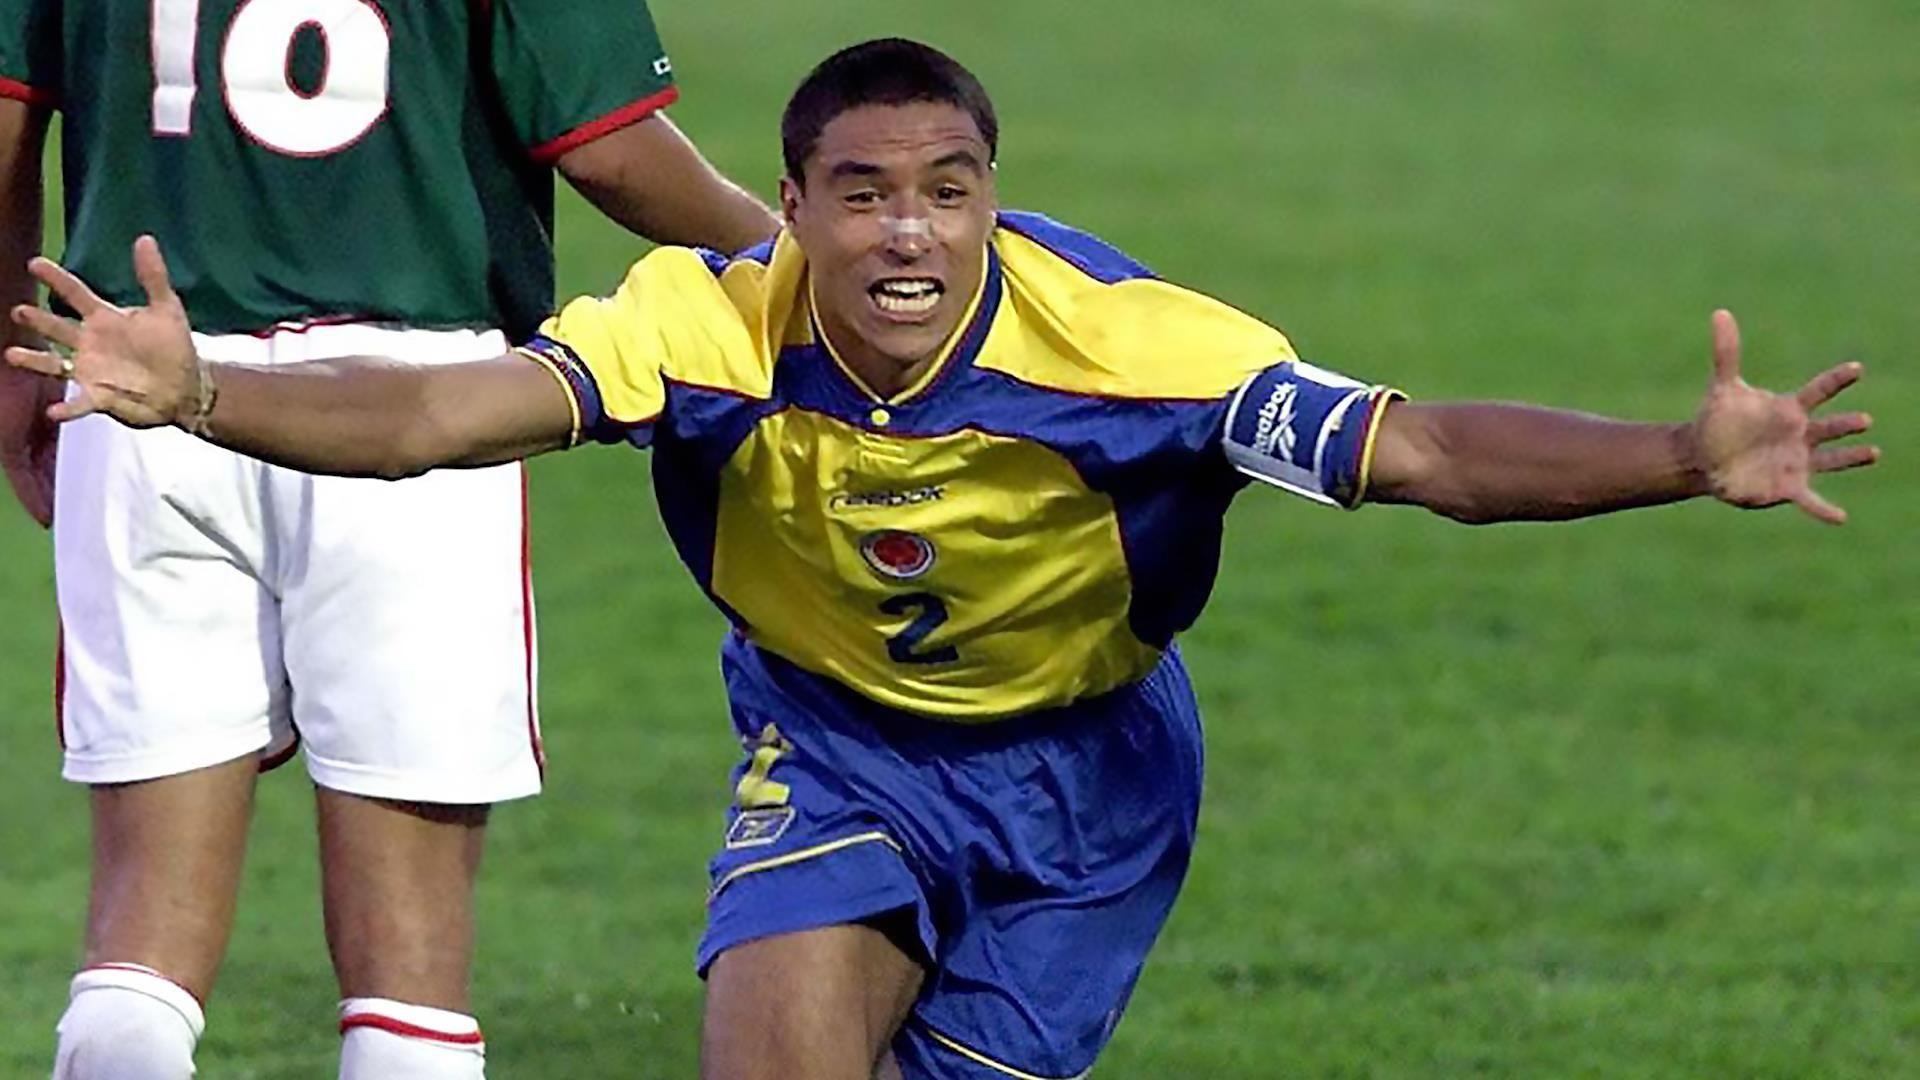 ExDT de la Selección Colombia confirmó que Iván Ramiro Córdoba estaba vetado